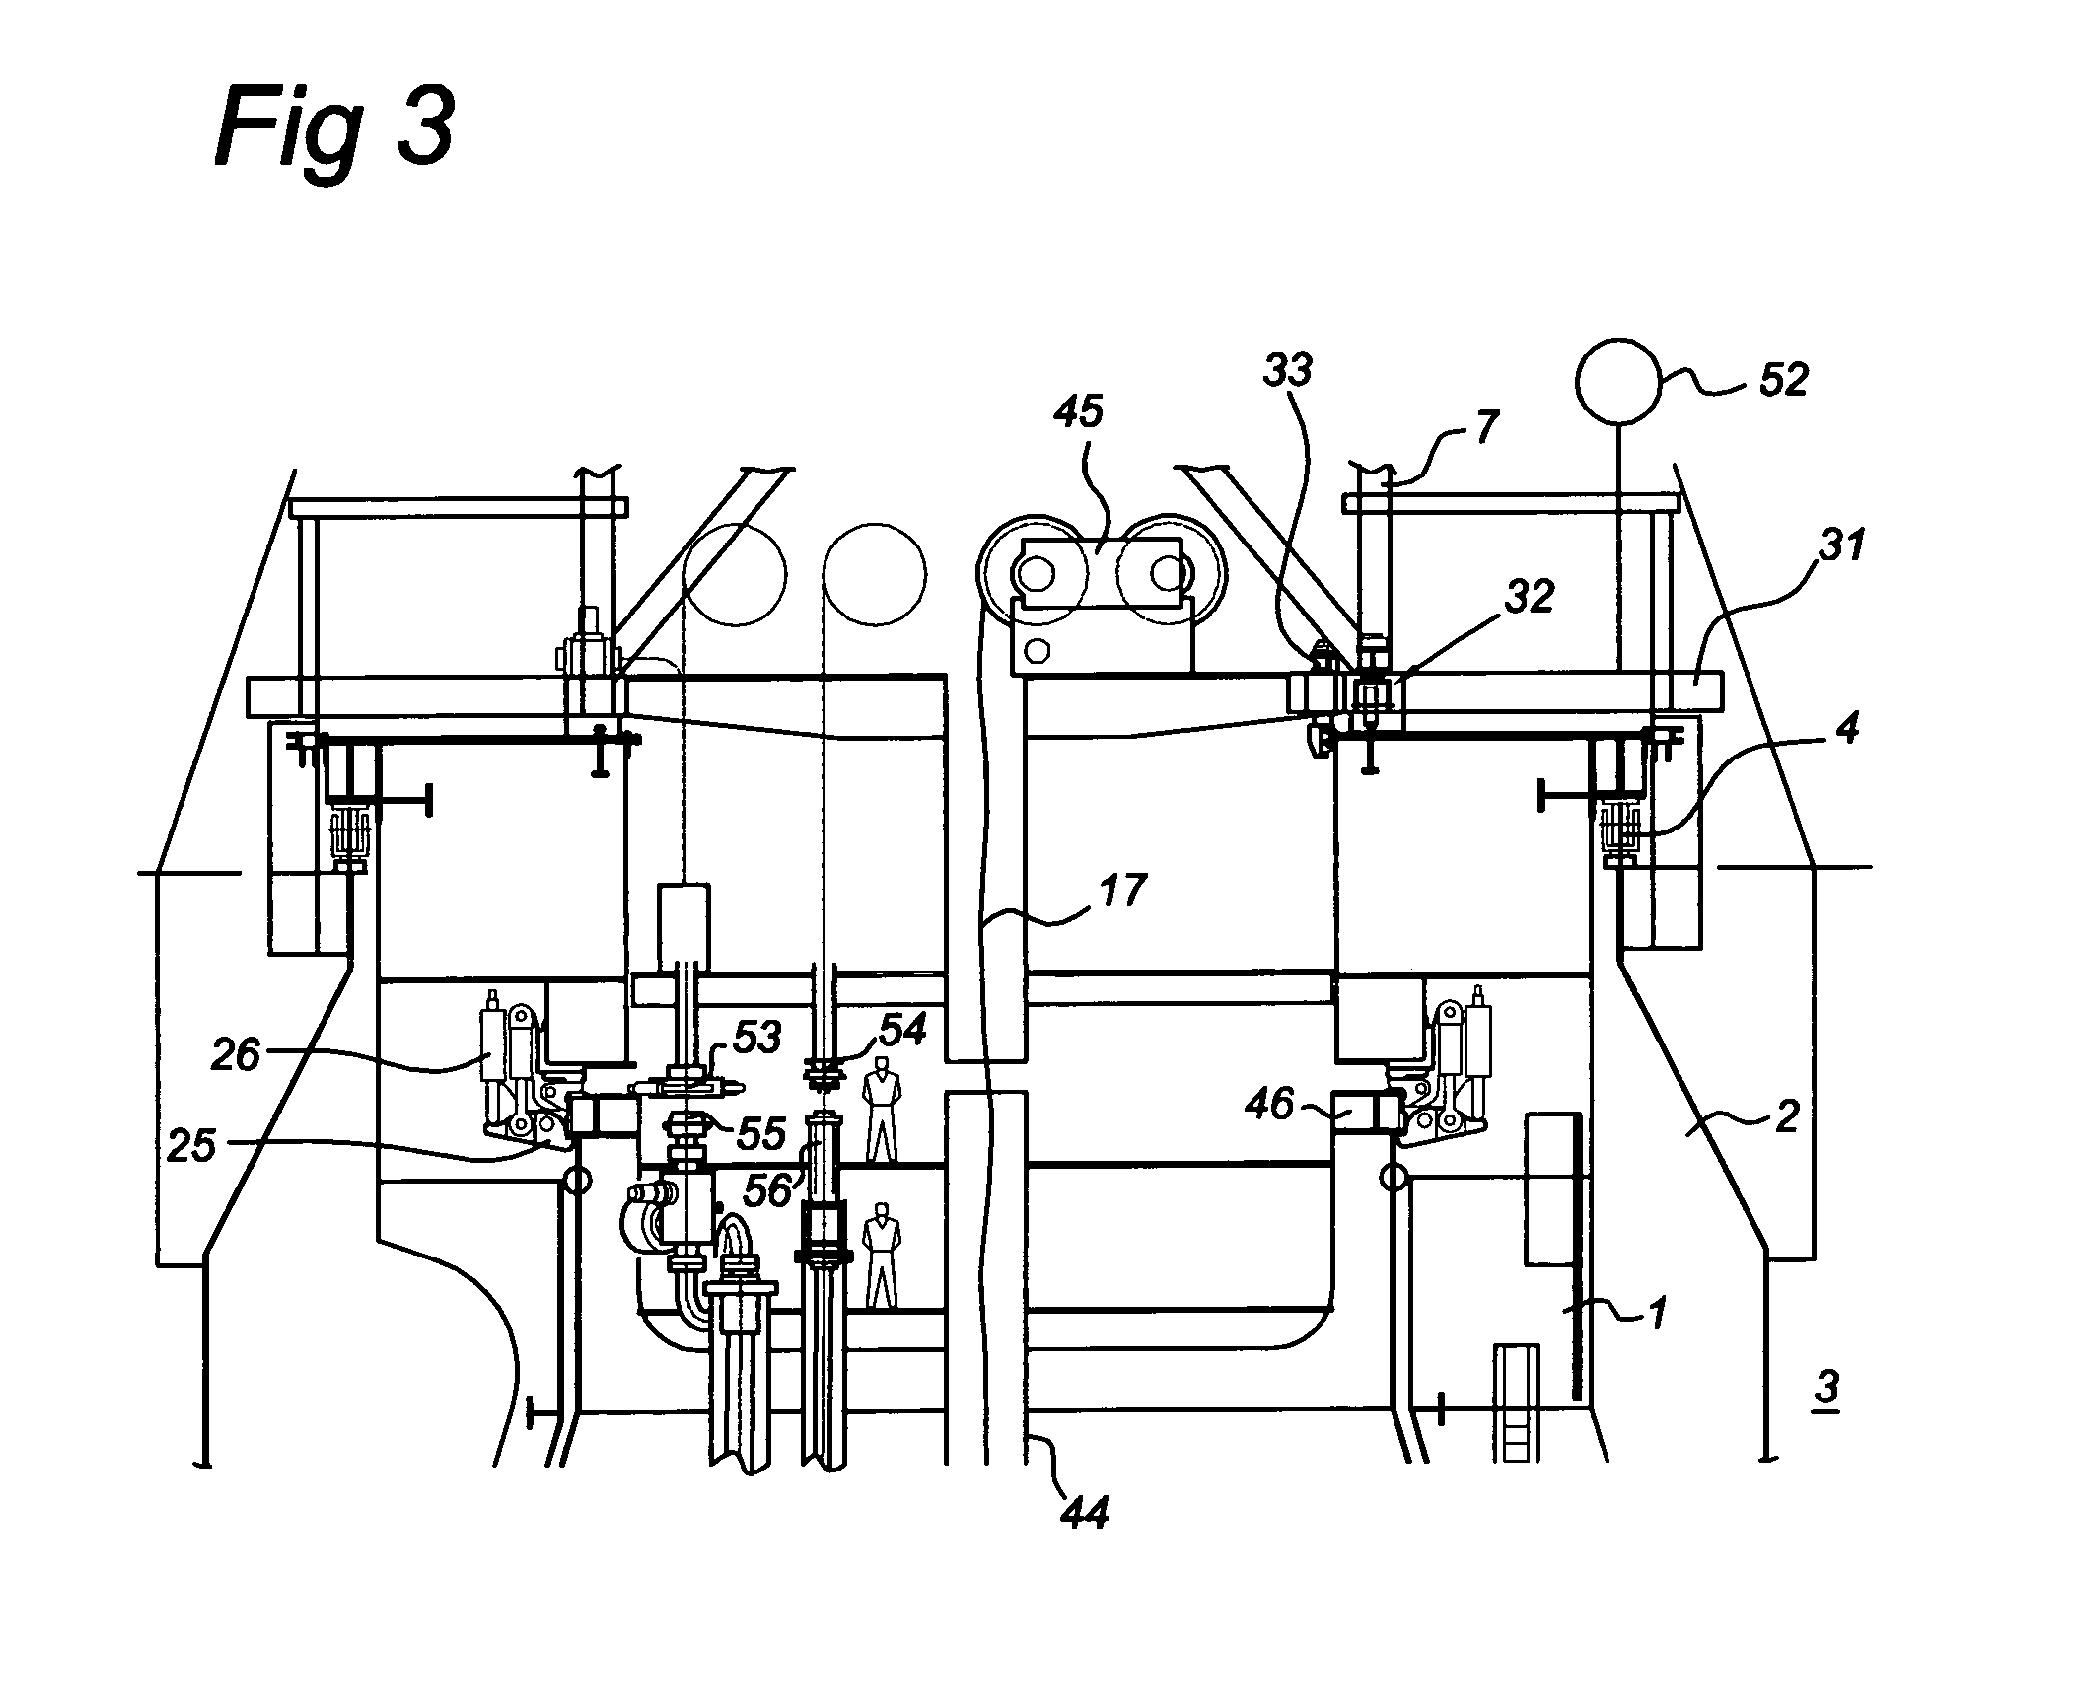 Winch Motor Parts Diagram On Winch Control Box Wiring Diagram